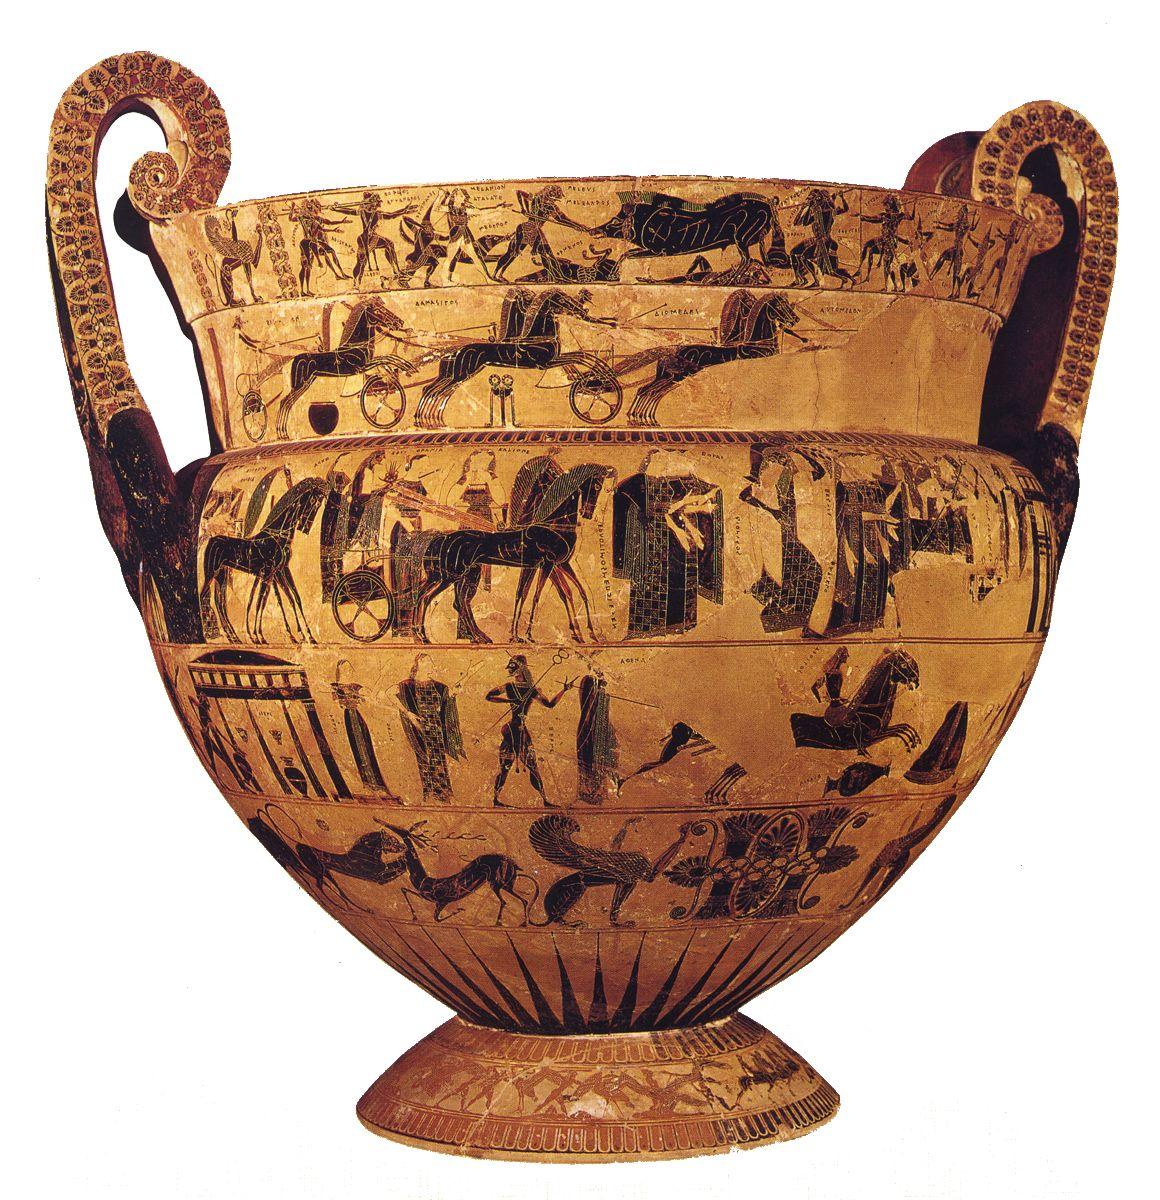 The franois vase greek pottery black figure and figure painting the francois vase keleitias painter ergotimos potter claypottery black figured phase reviewsmspy